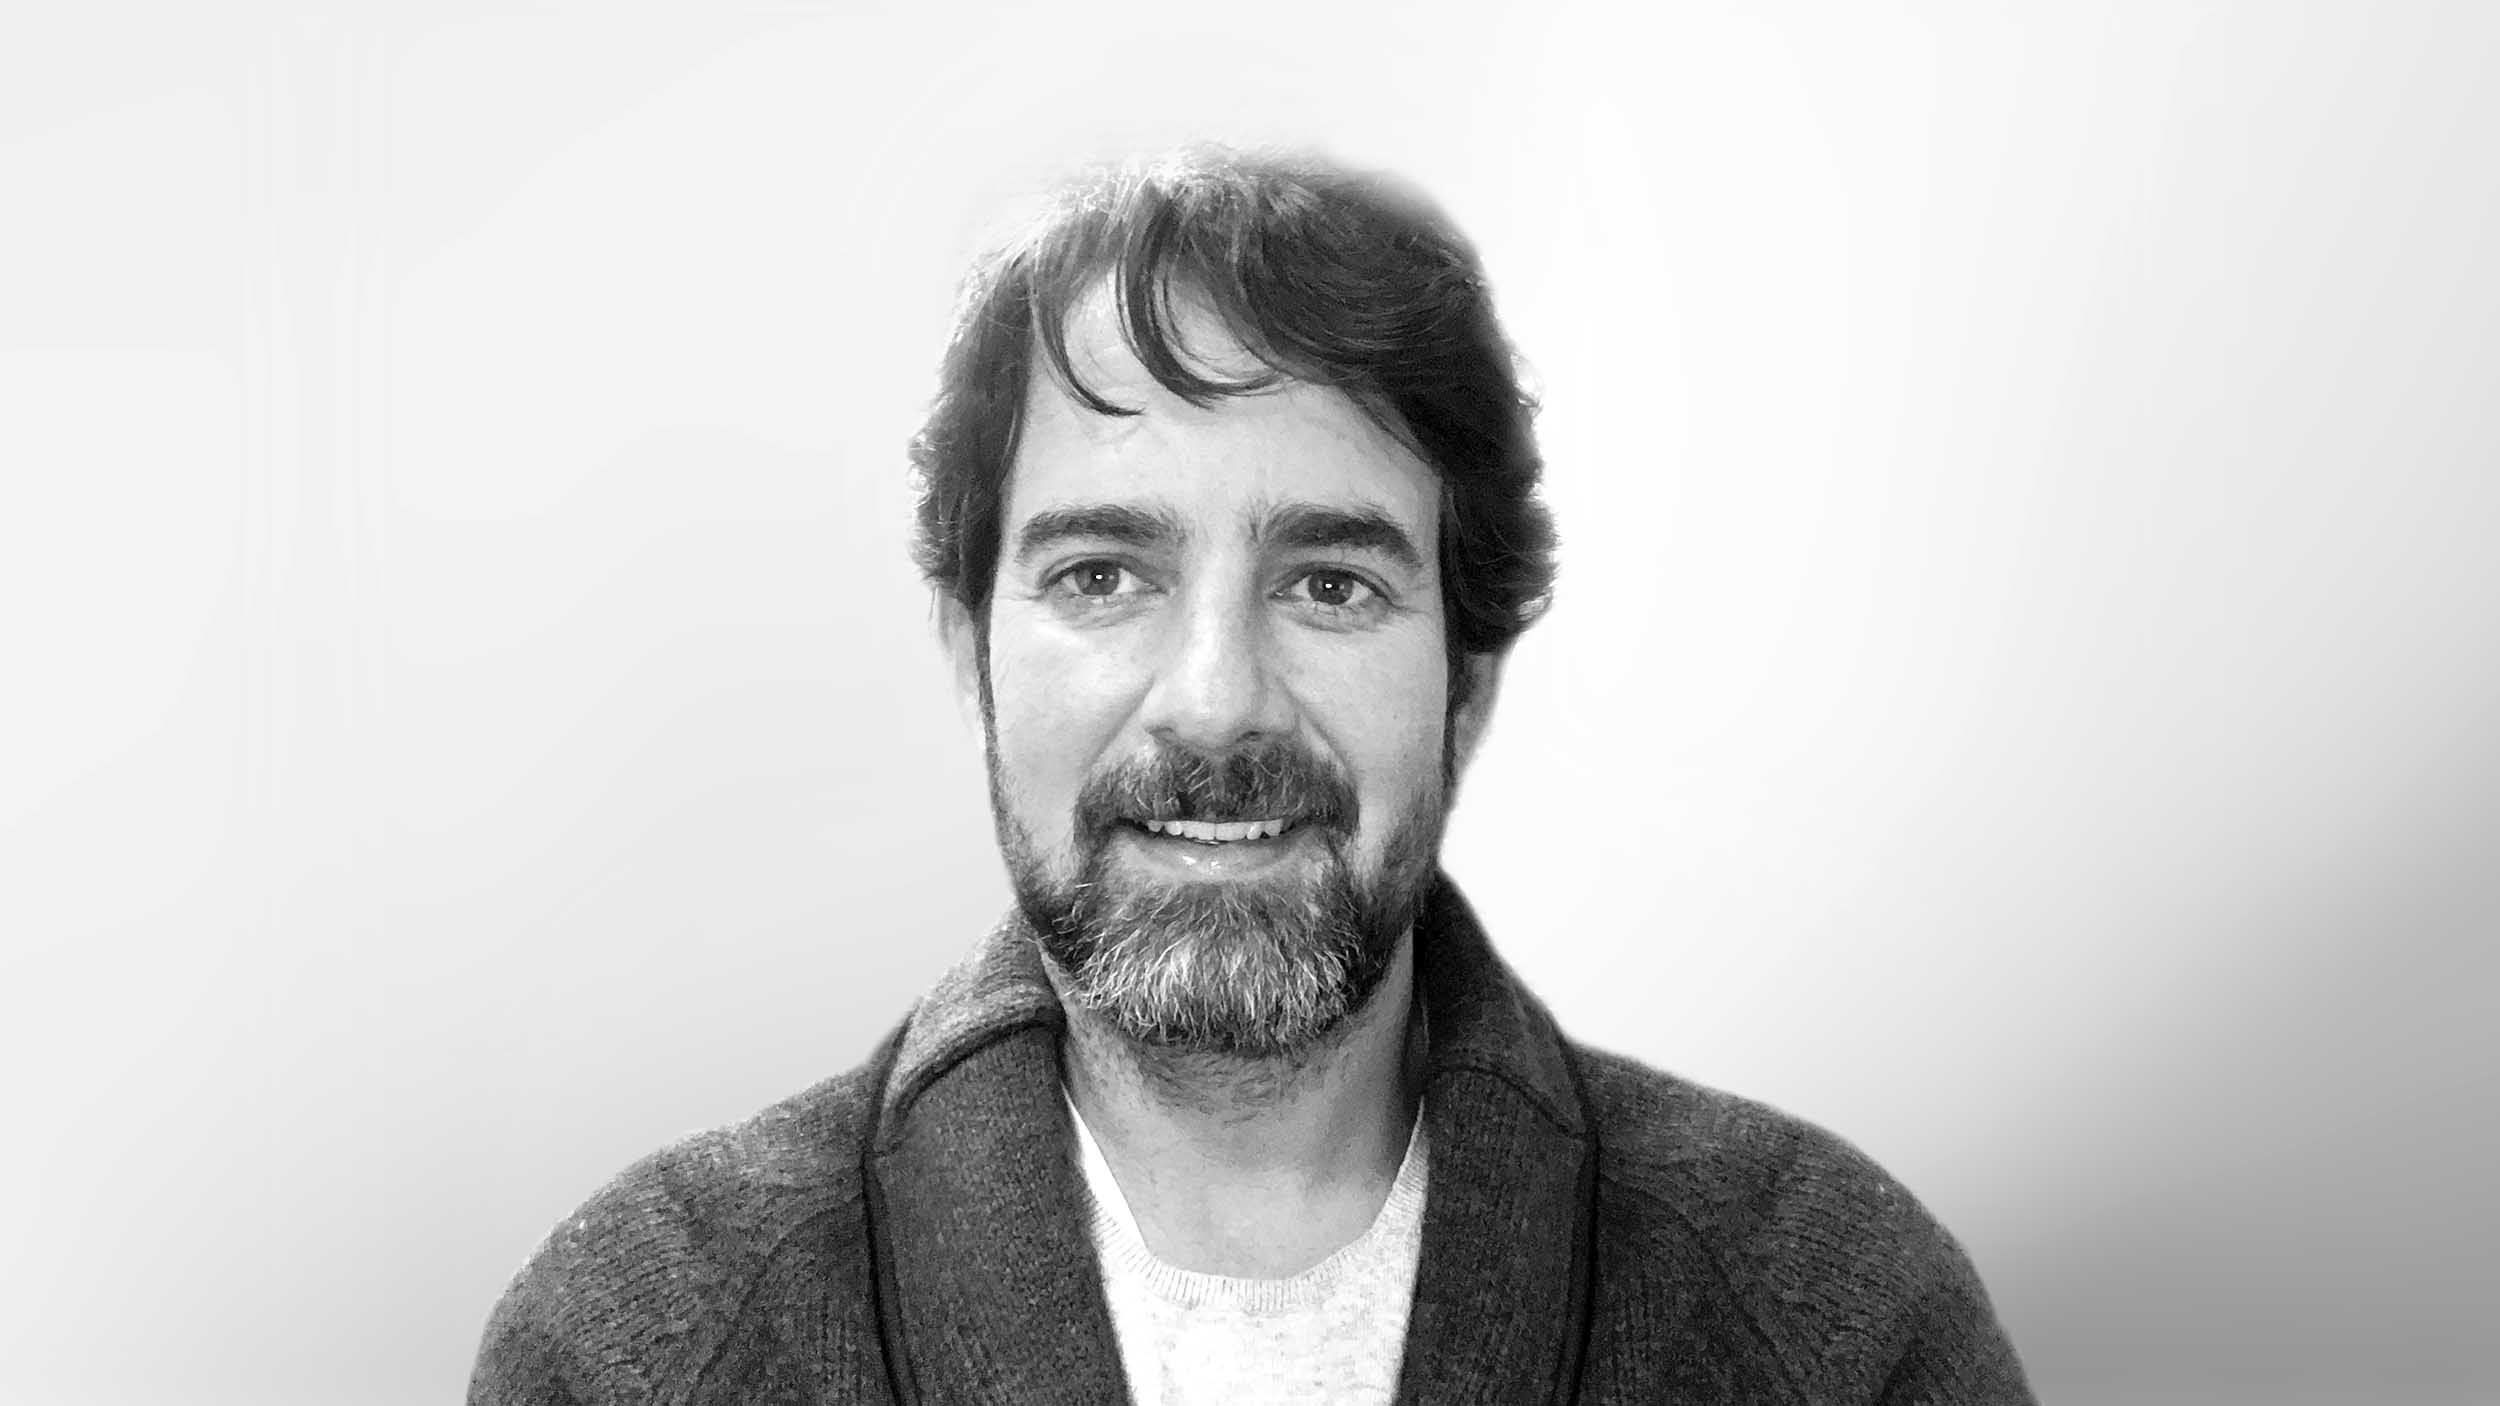 Camilo Montano